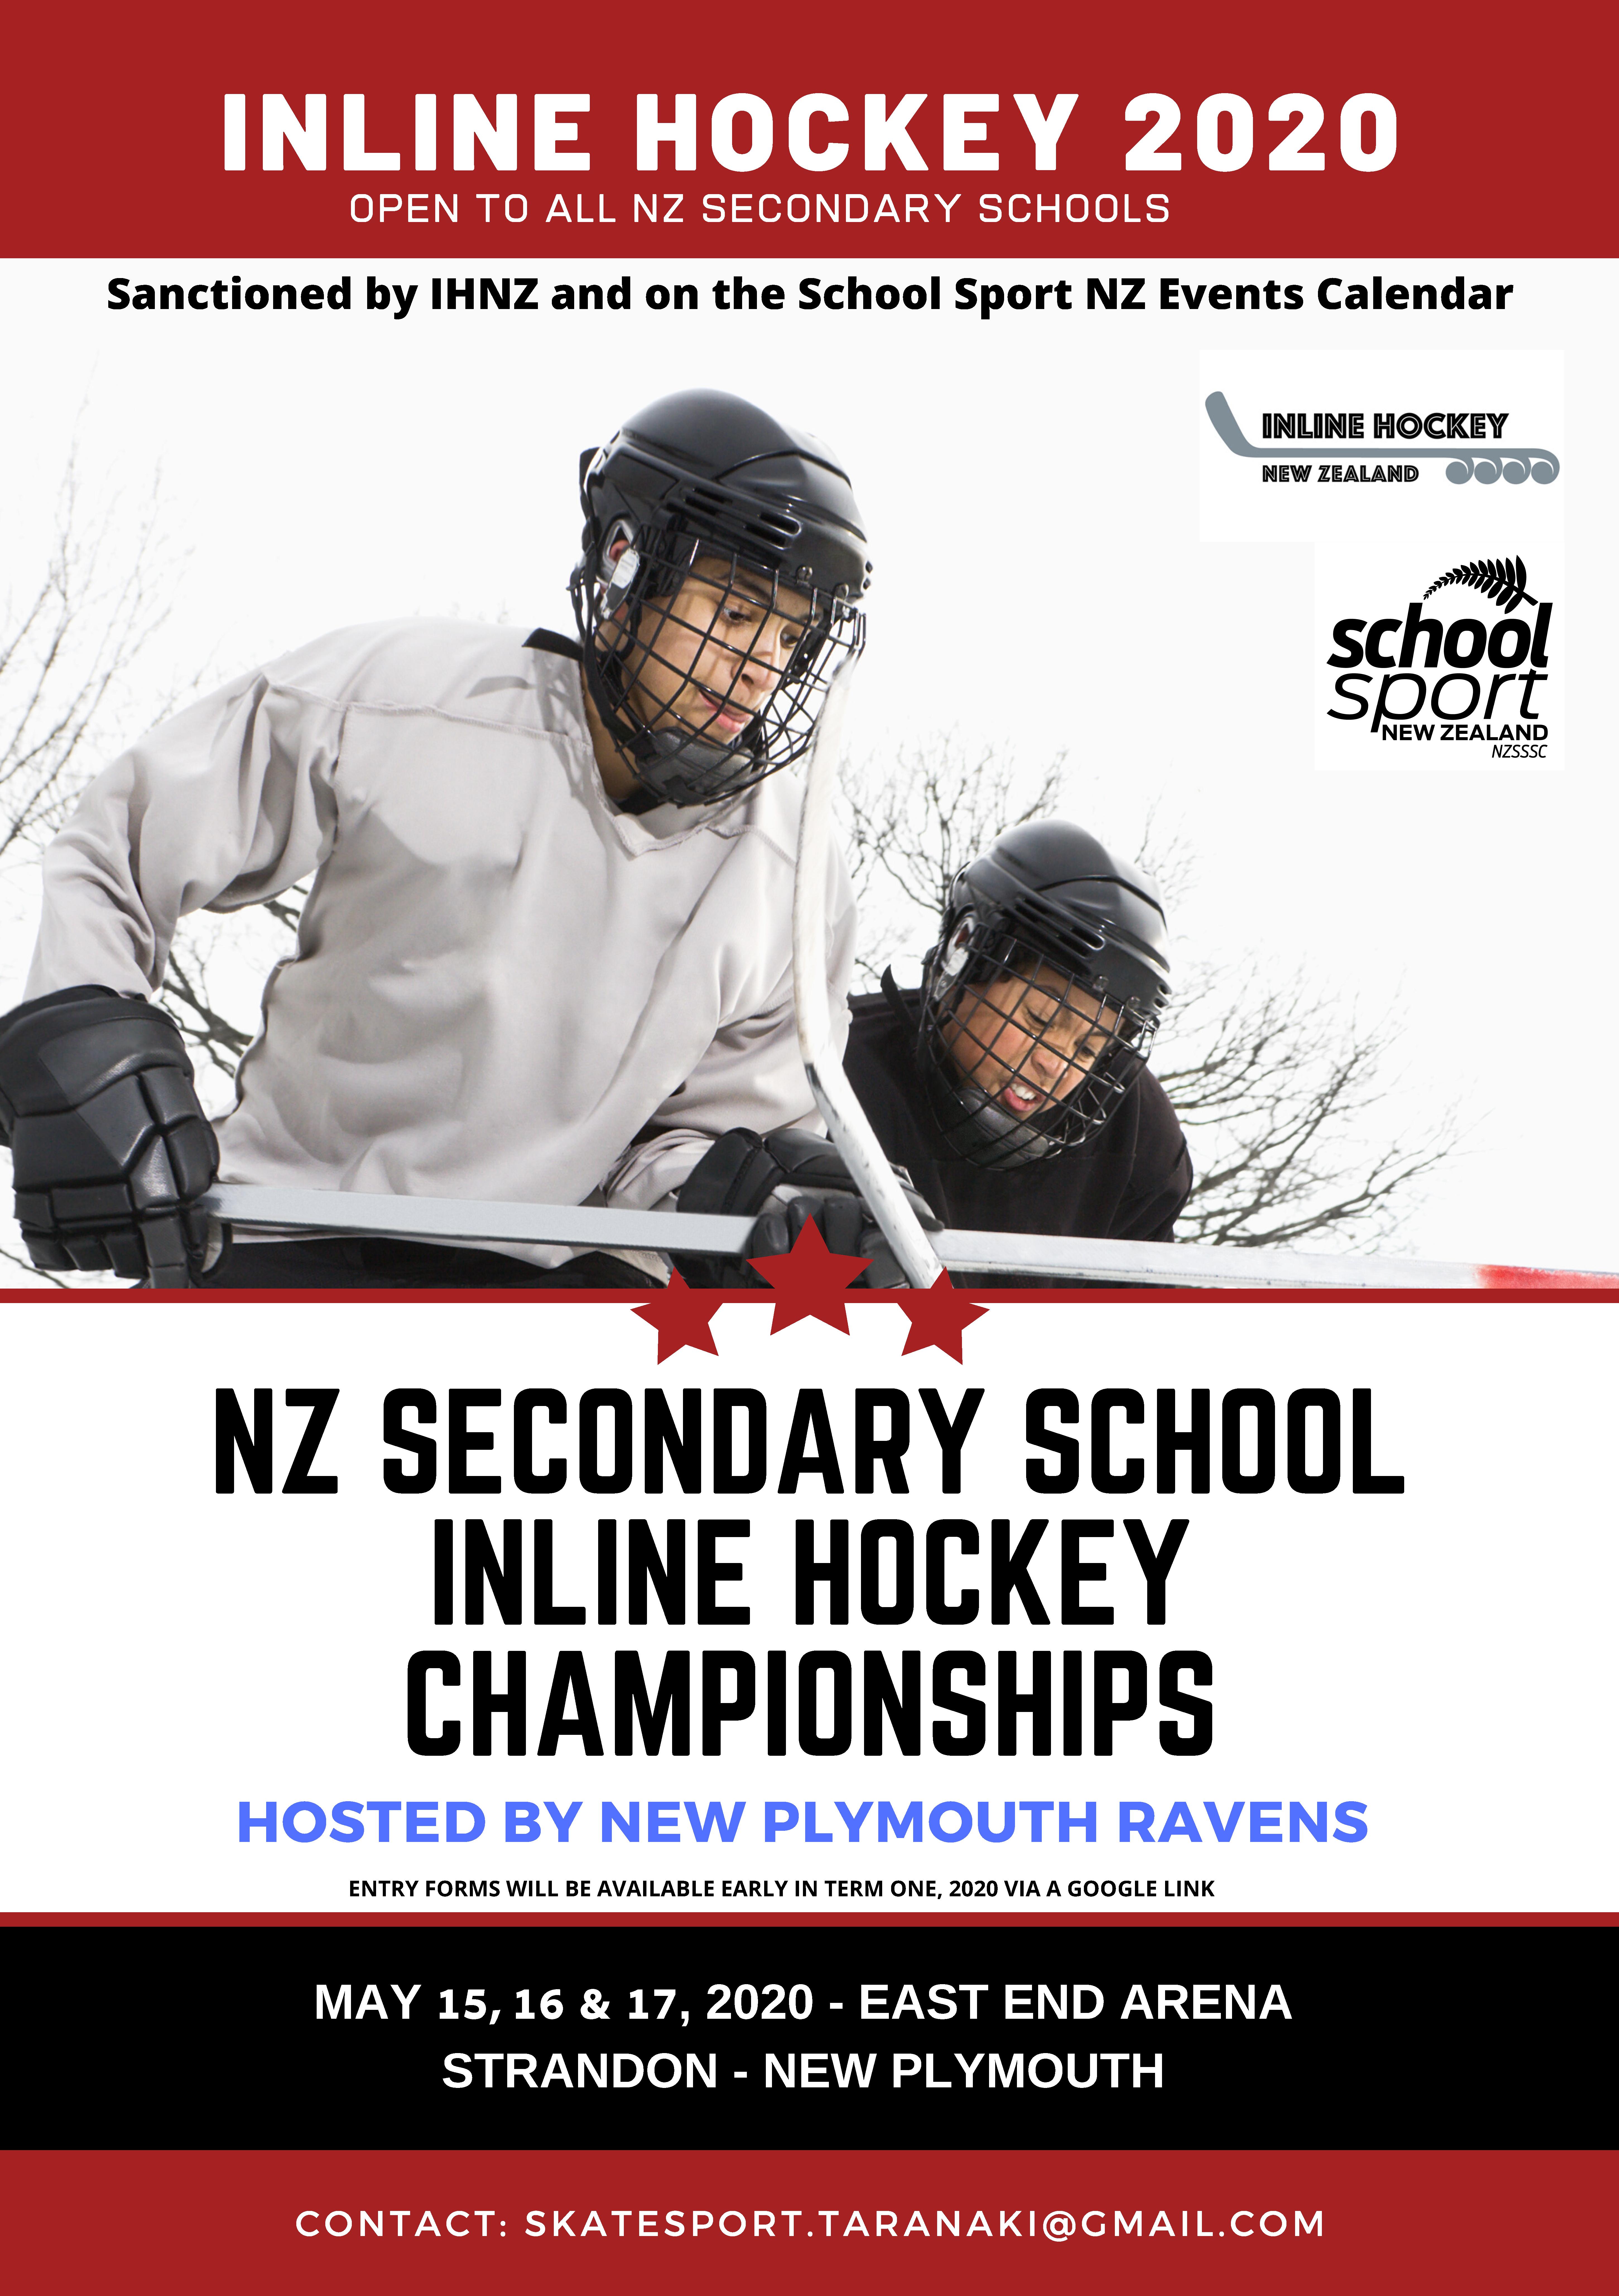 NZ Secondary School Championships